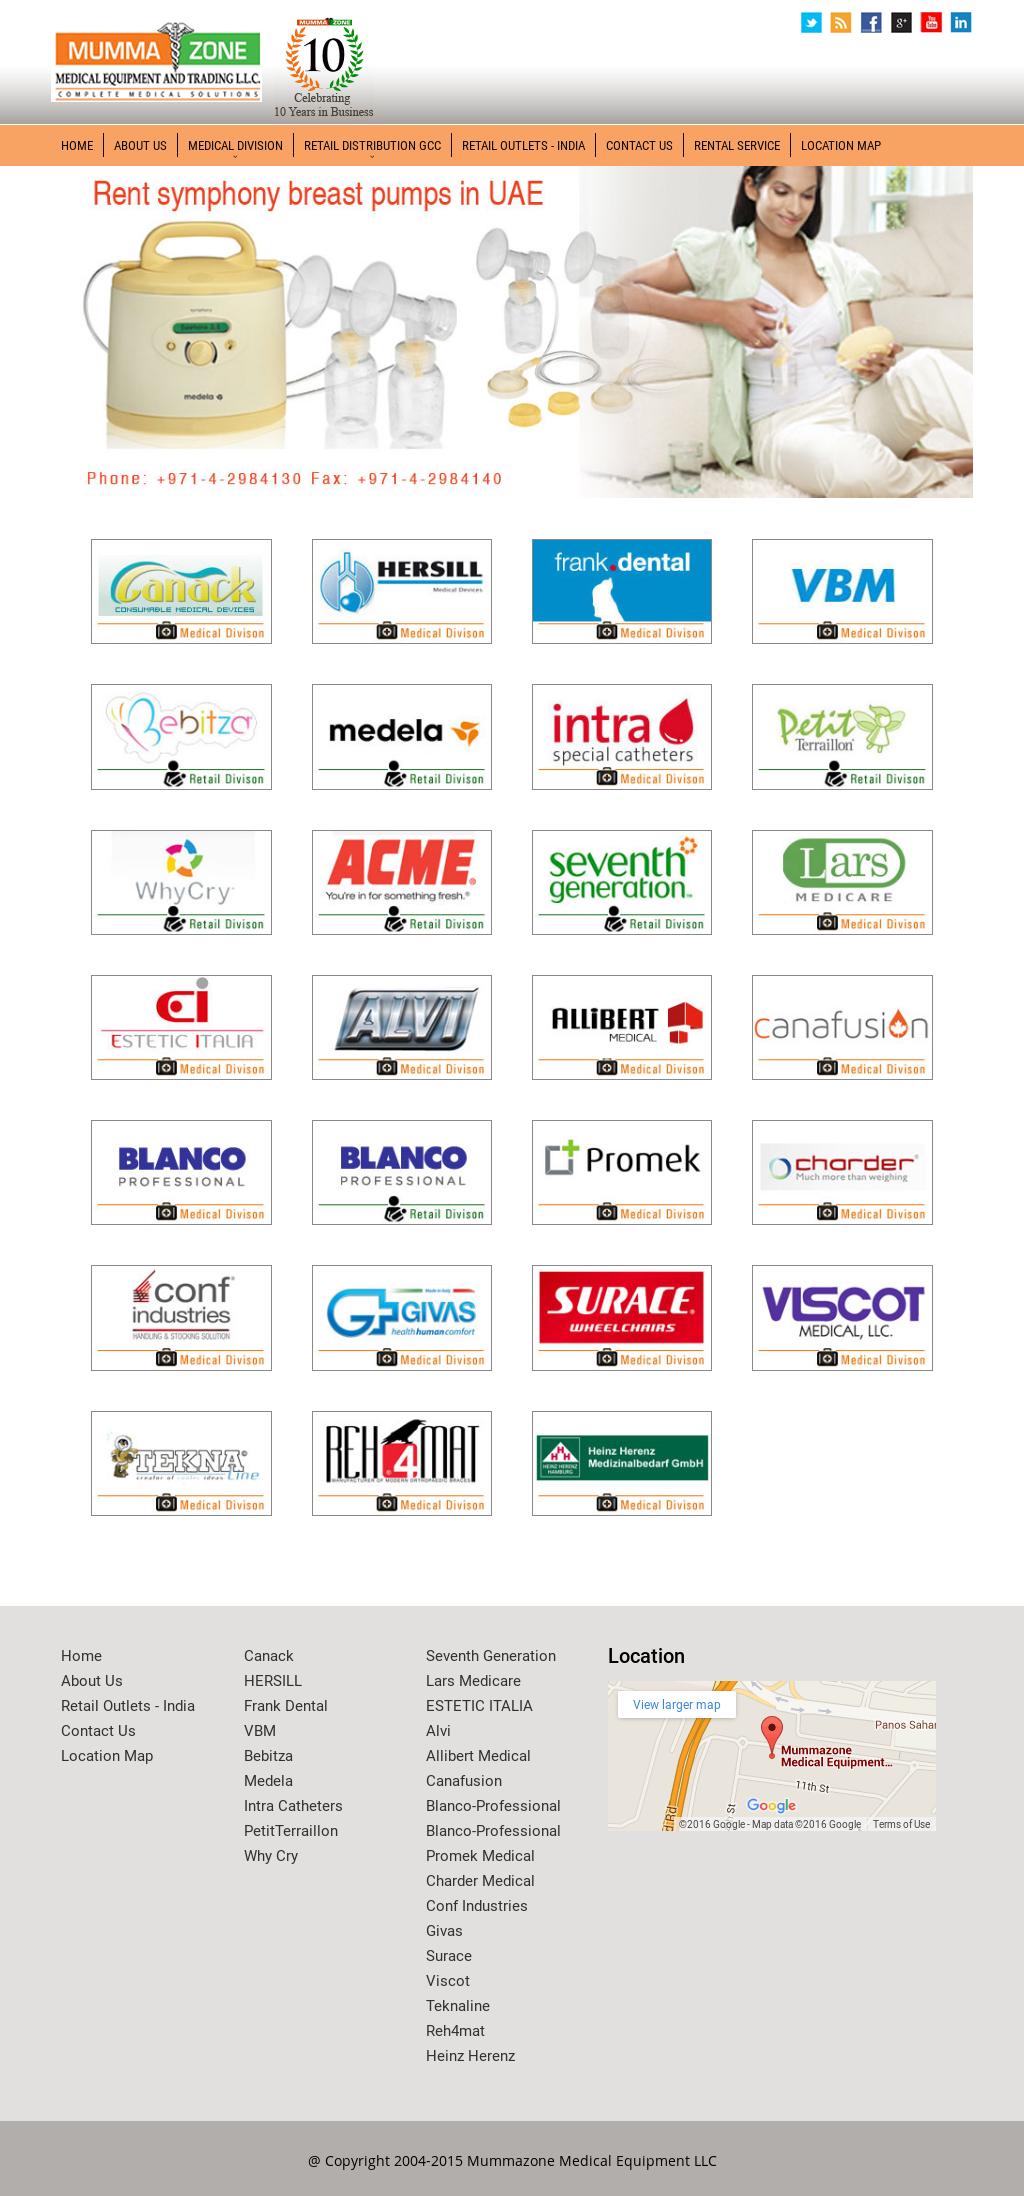 Mummazone Medical Equipment And Trading Competitors, Revenue